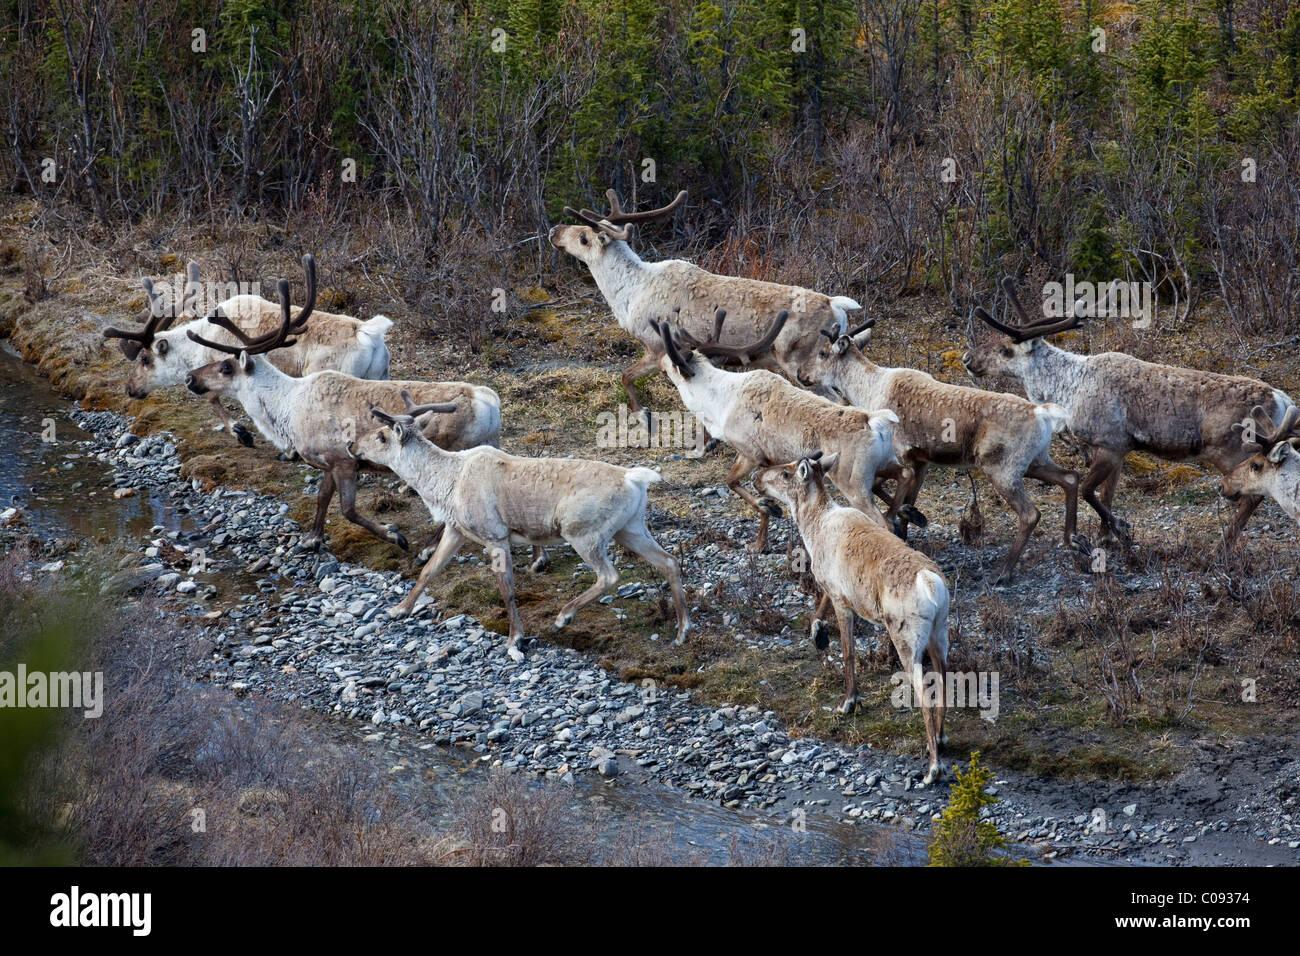 Band of caribou cross a shallow tributary of Savage River, Denali National Park, Interior Alaska, Spring - Stock Image